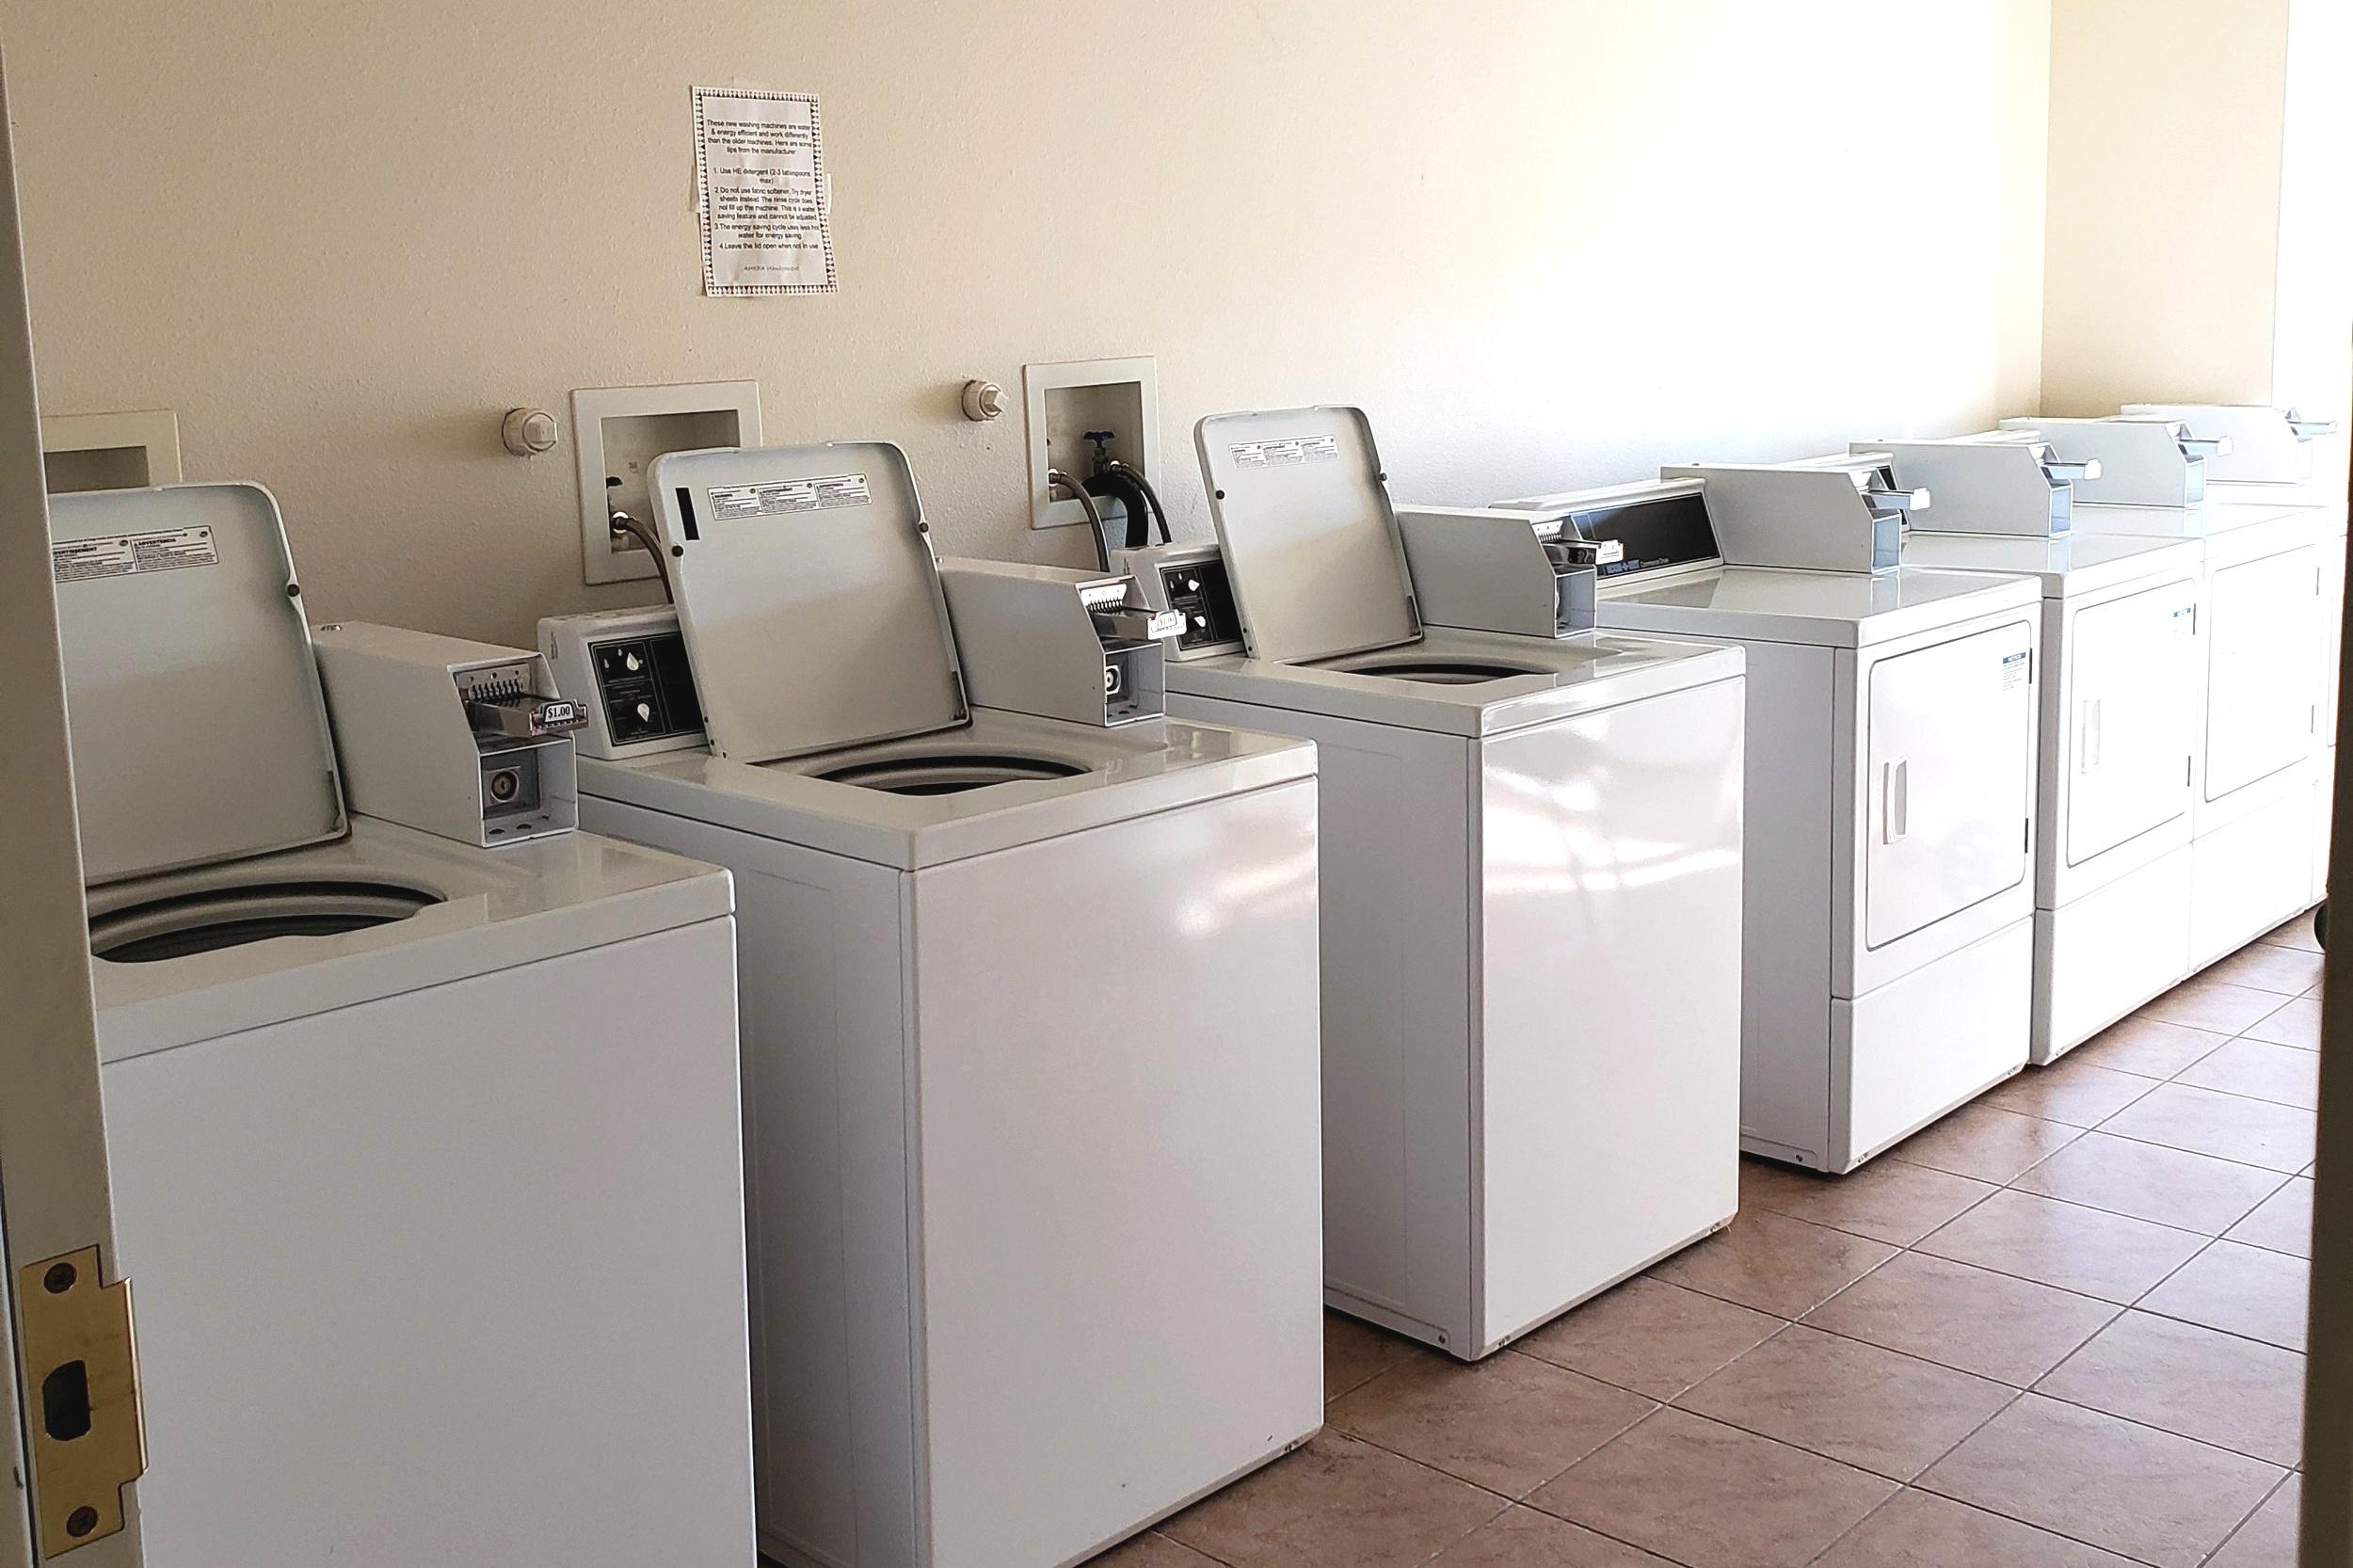 A50102_Laundry Room_2018Nov14.jpg